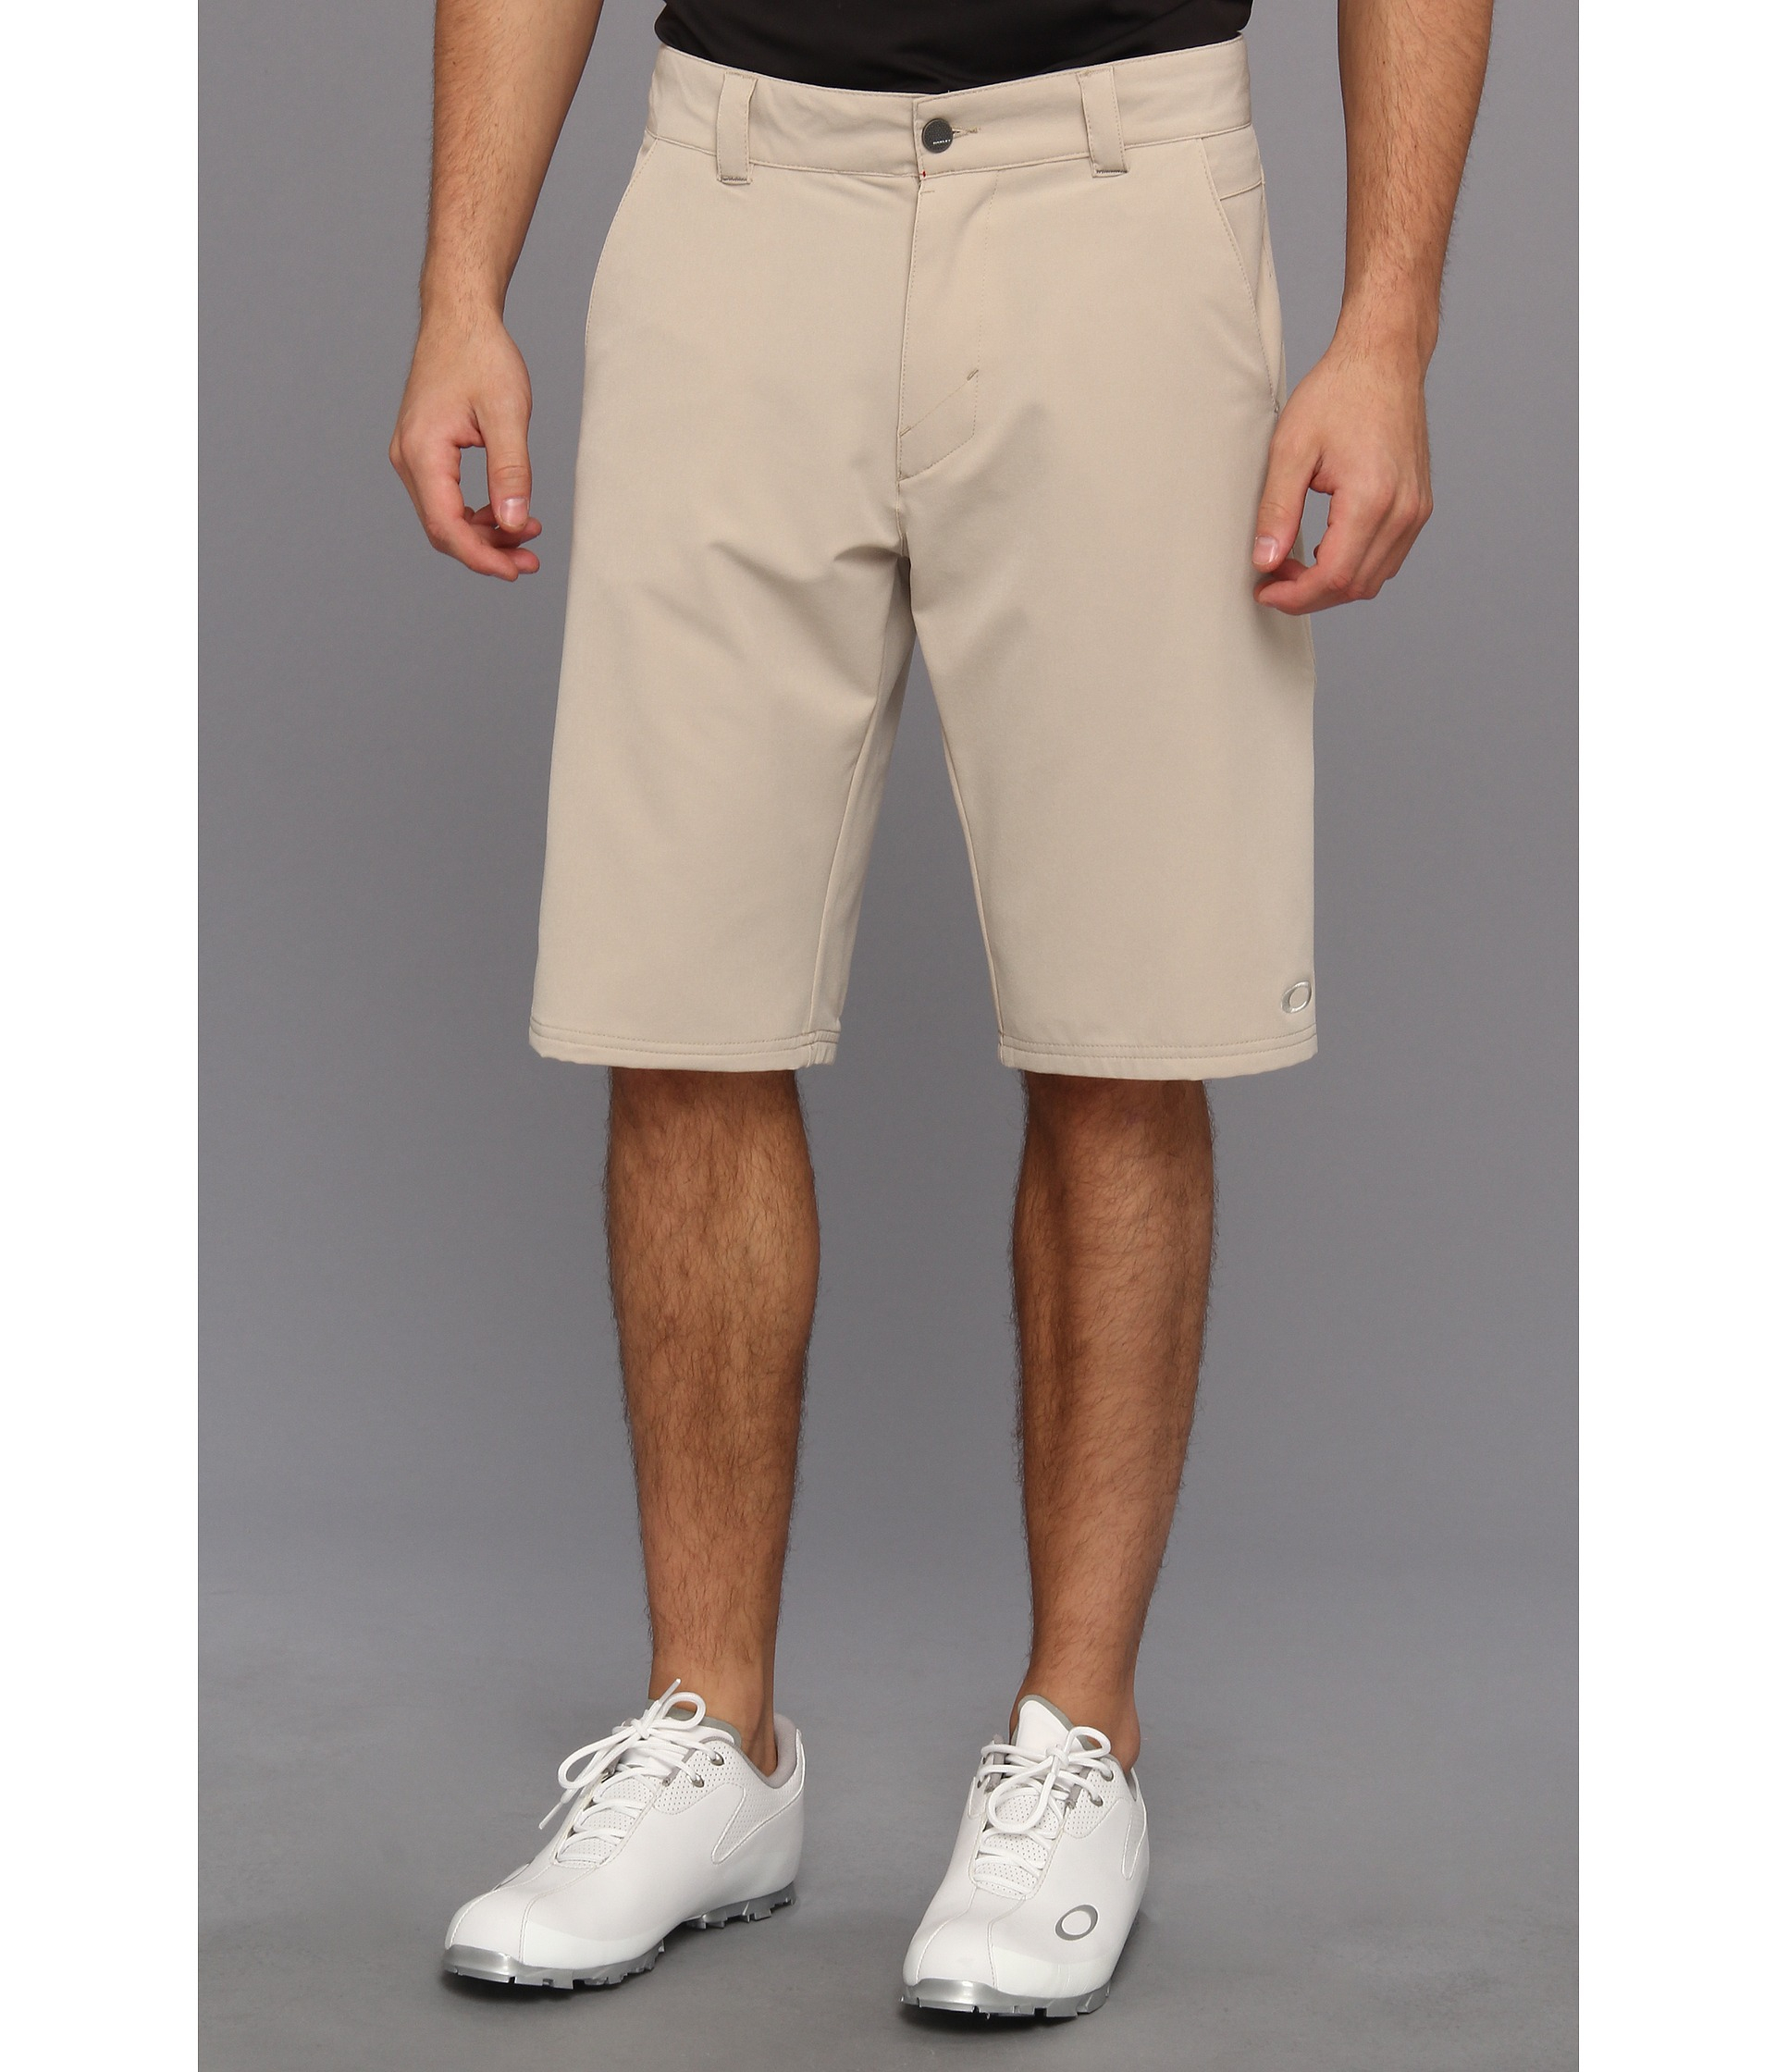 oakley si ballistic crosshoakley sliver foldable review micq  oakley take shorts 25